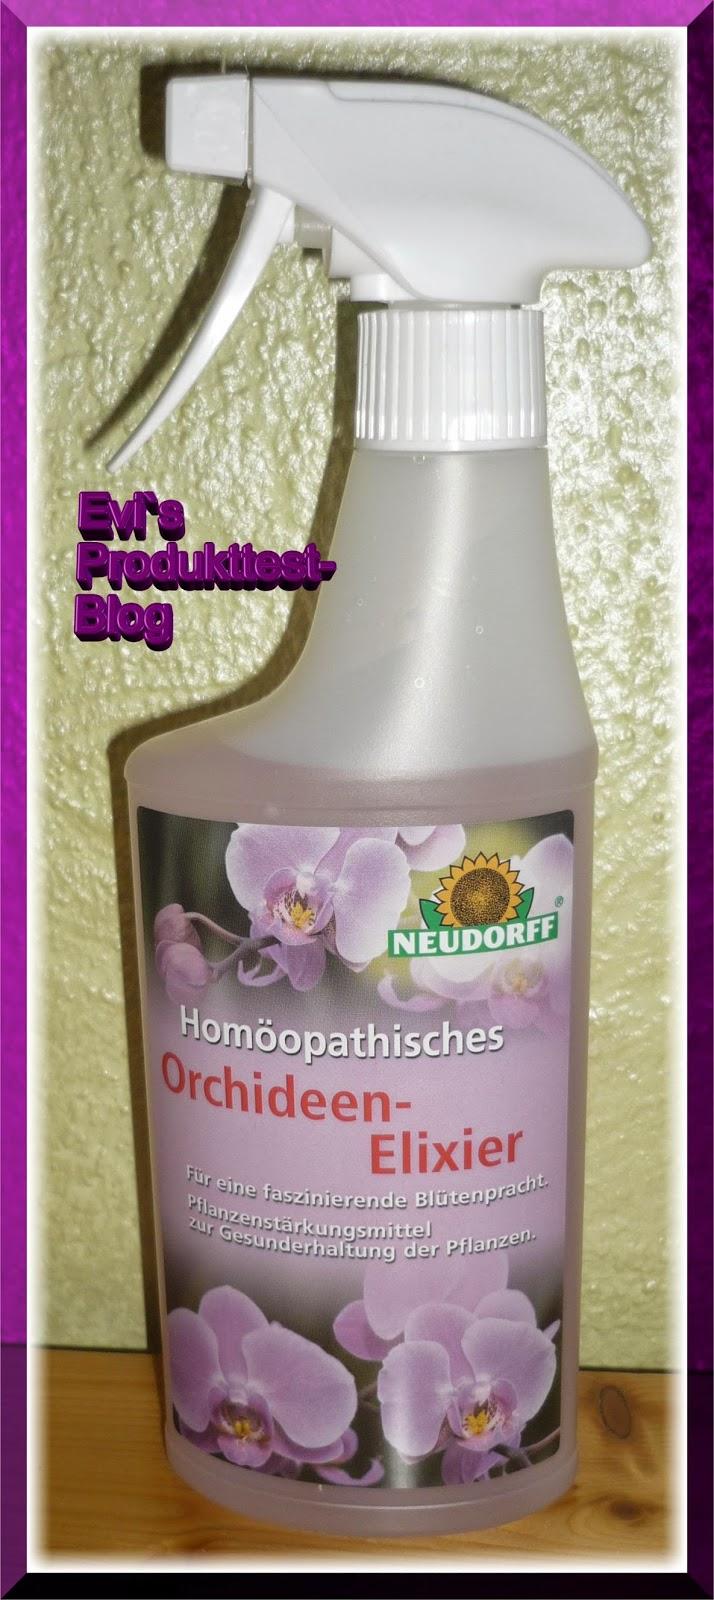 evi s produkttestblog die richtige pflege f r orchideen. Black Bedroom Furniture Sets. Home Design Ideas